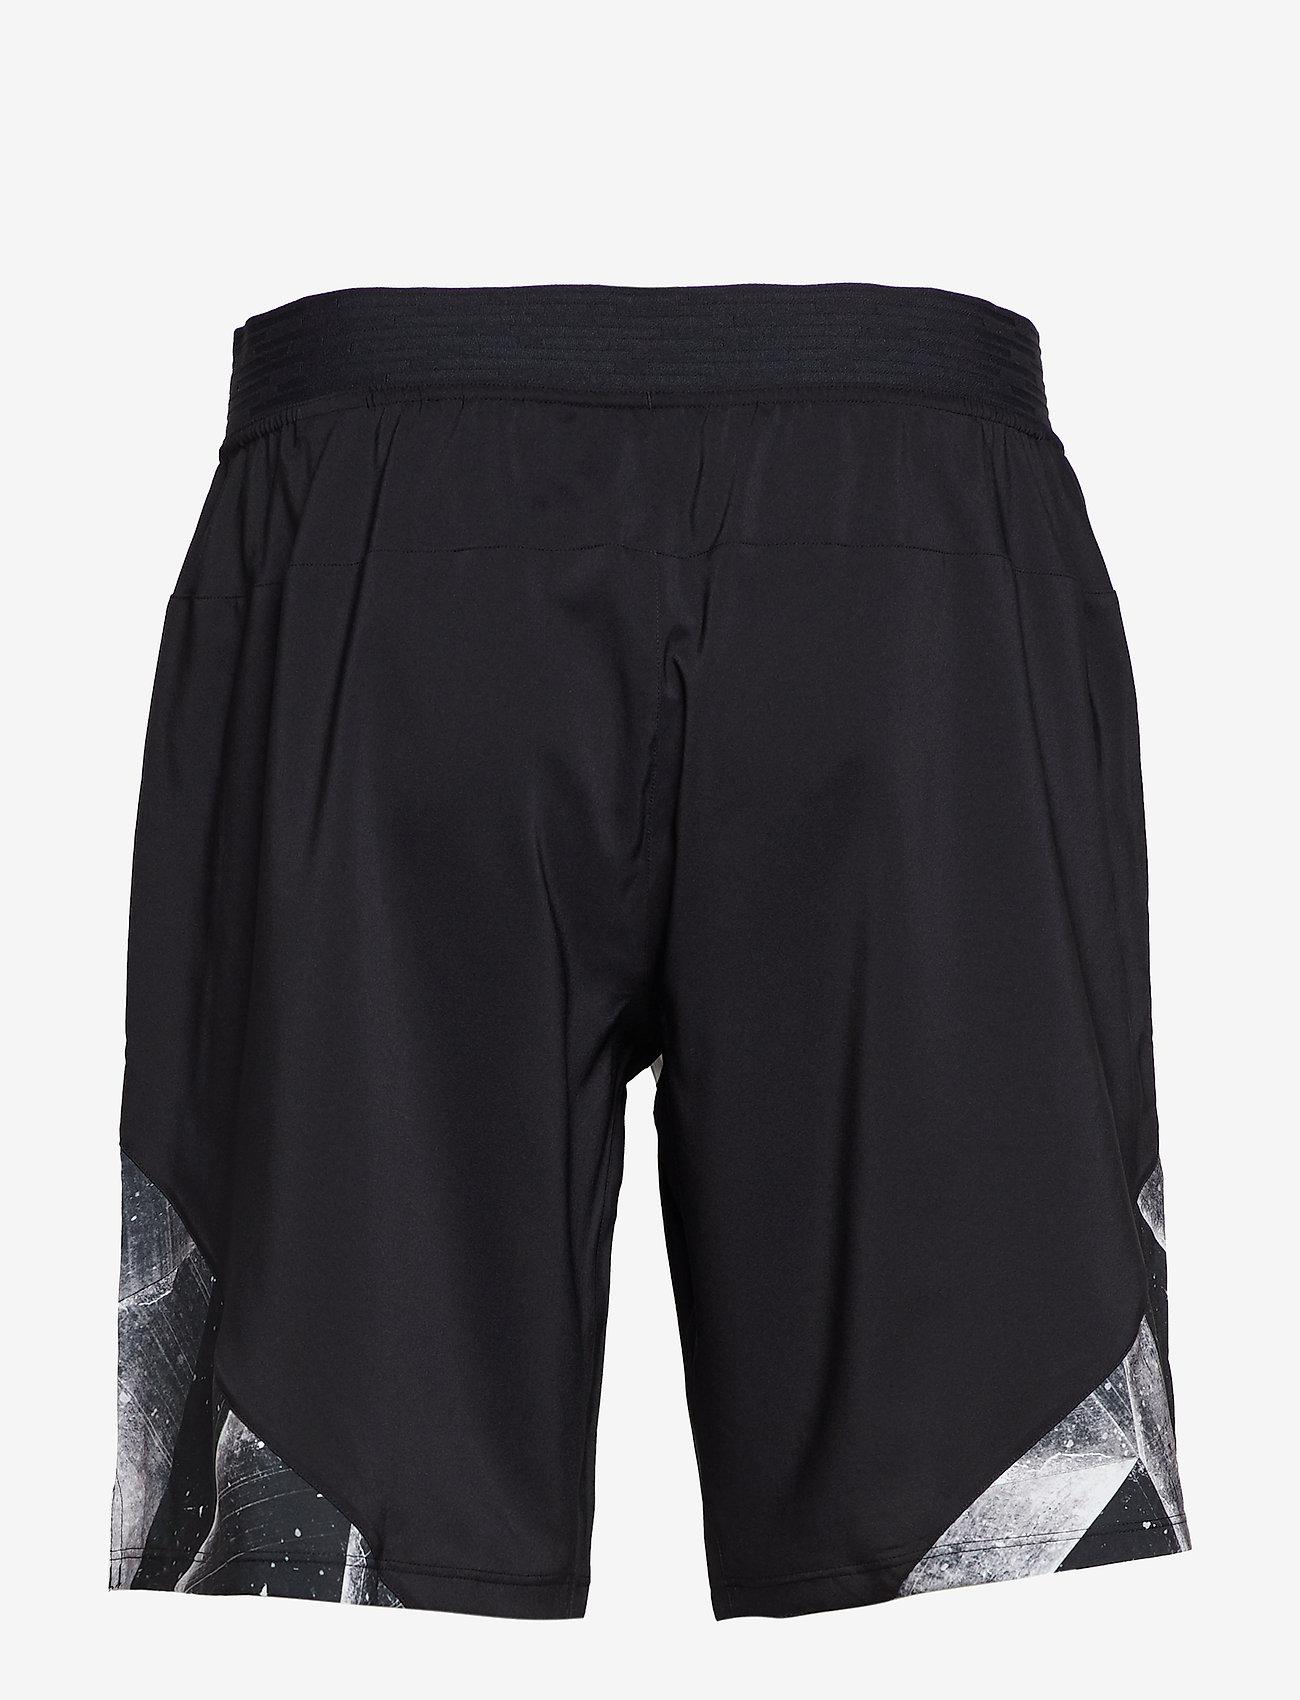 Reebok Performance Ost Epic Ltwt Cracked Ice - Shorts